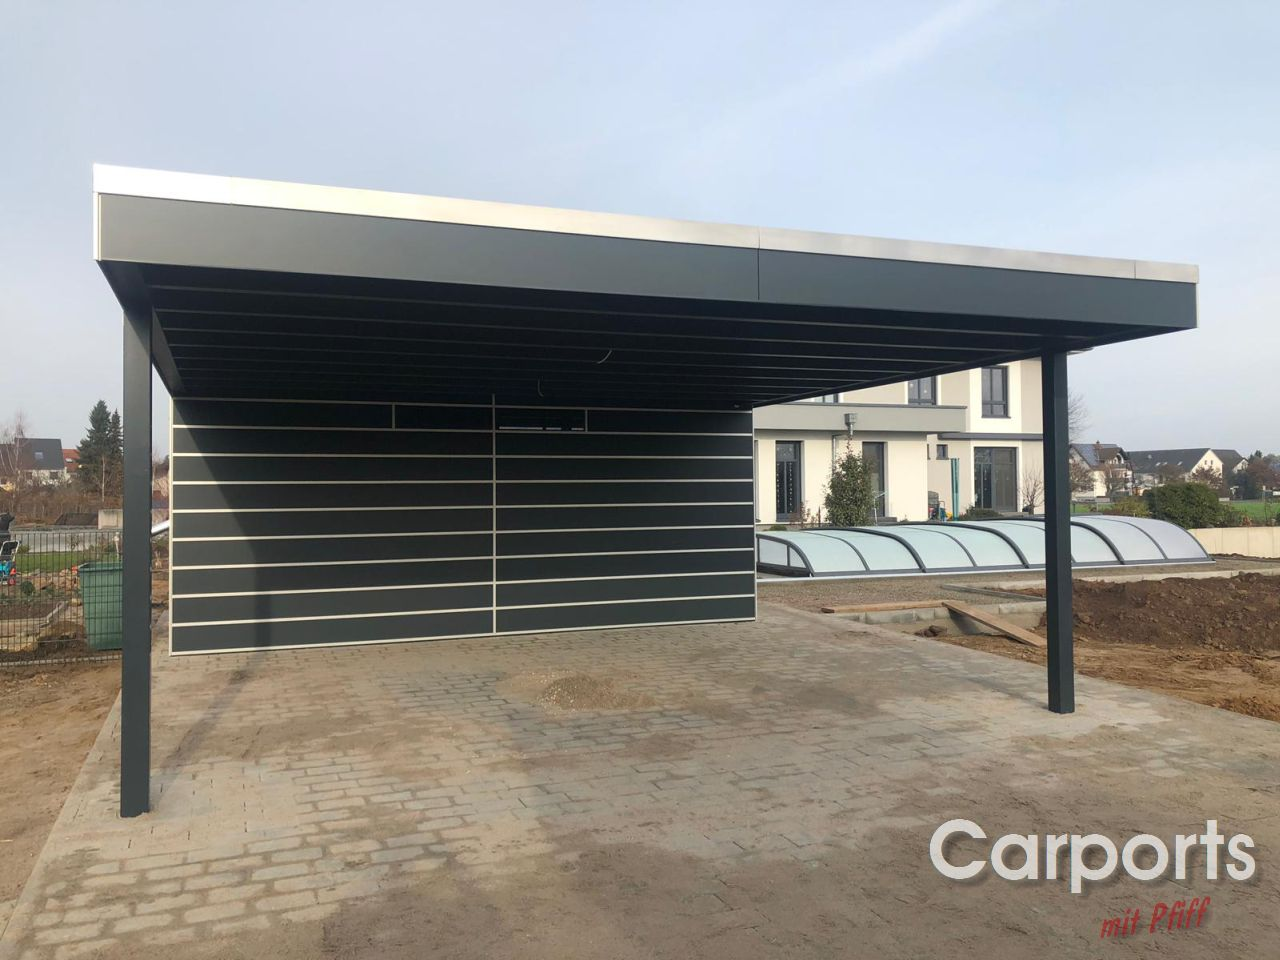 Carport mit Schuppen Archives - Carports mit Pfiff ...